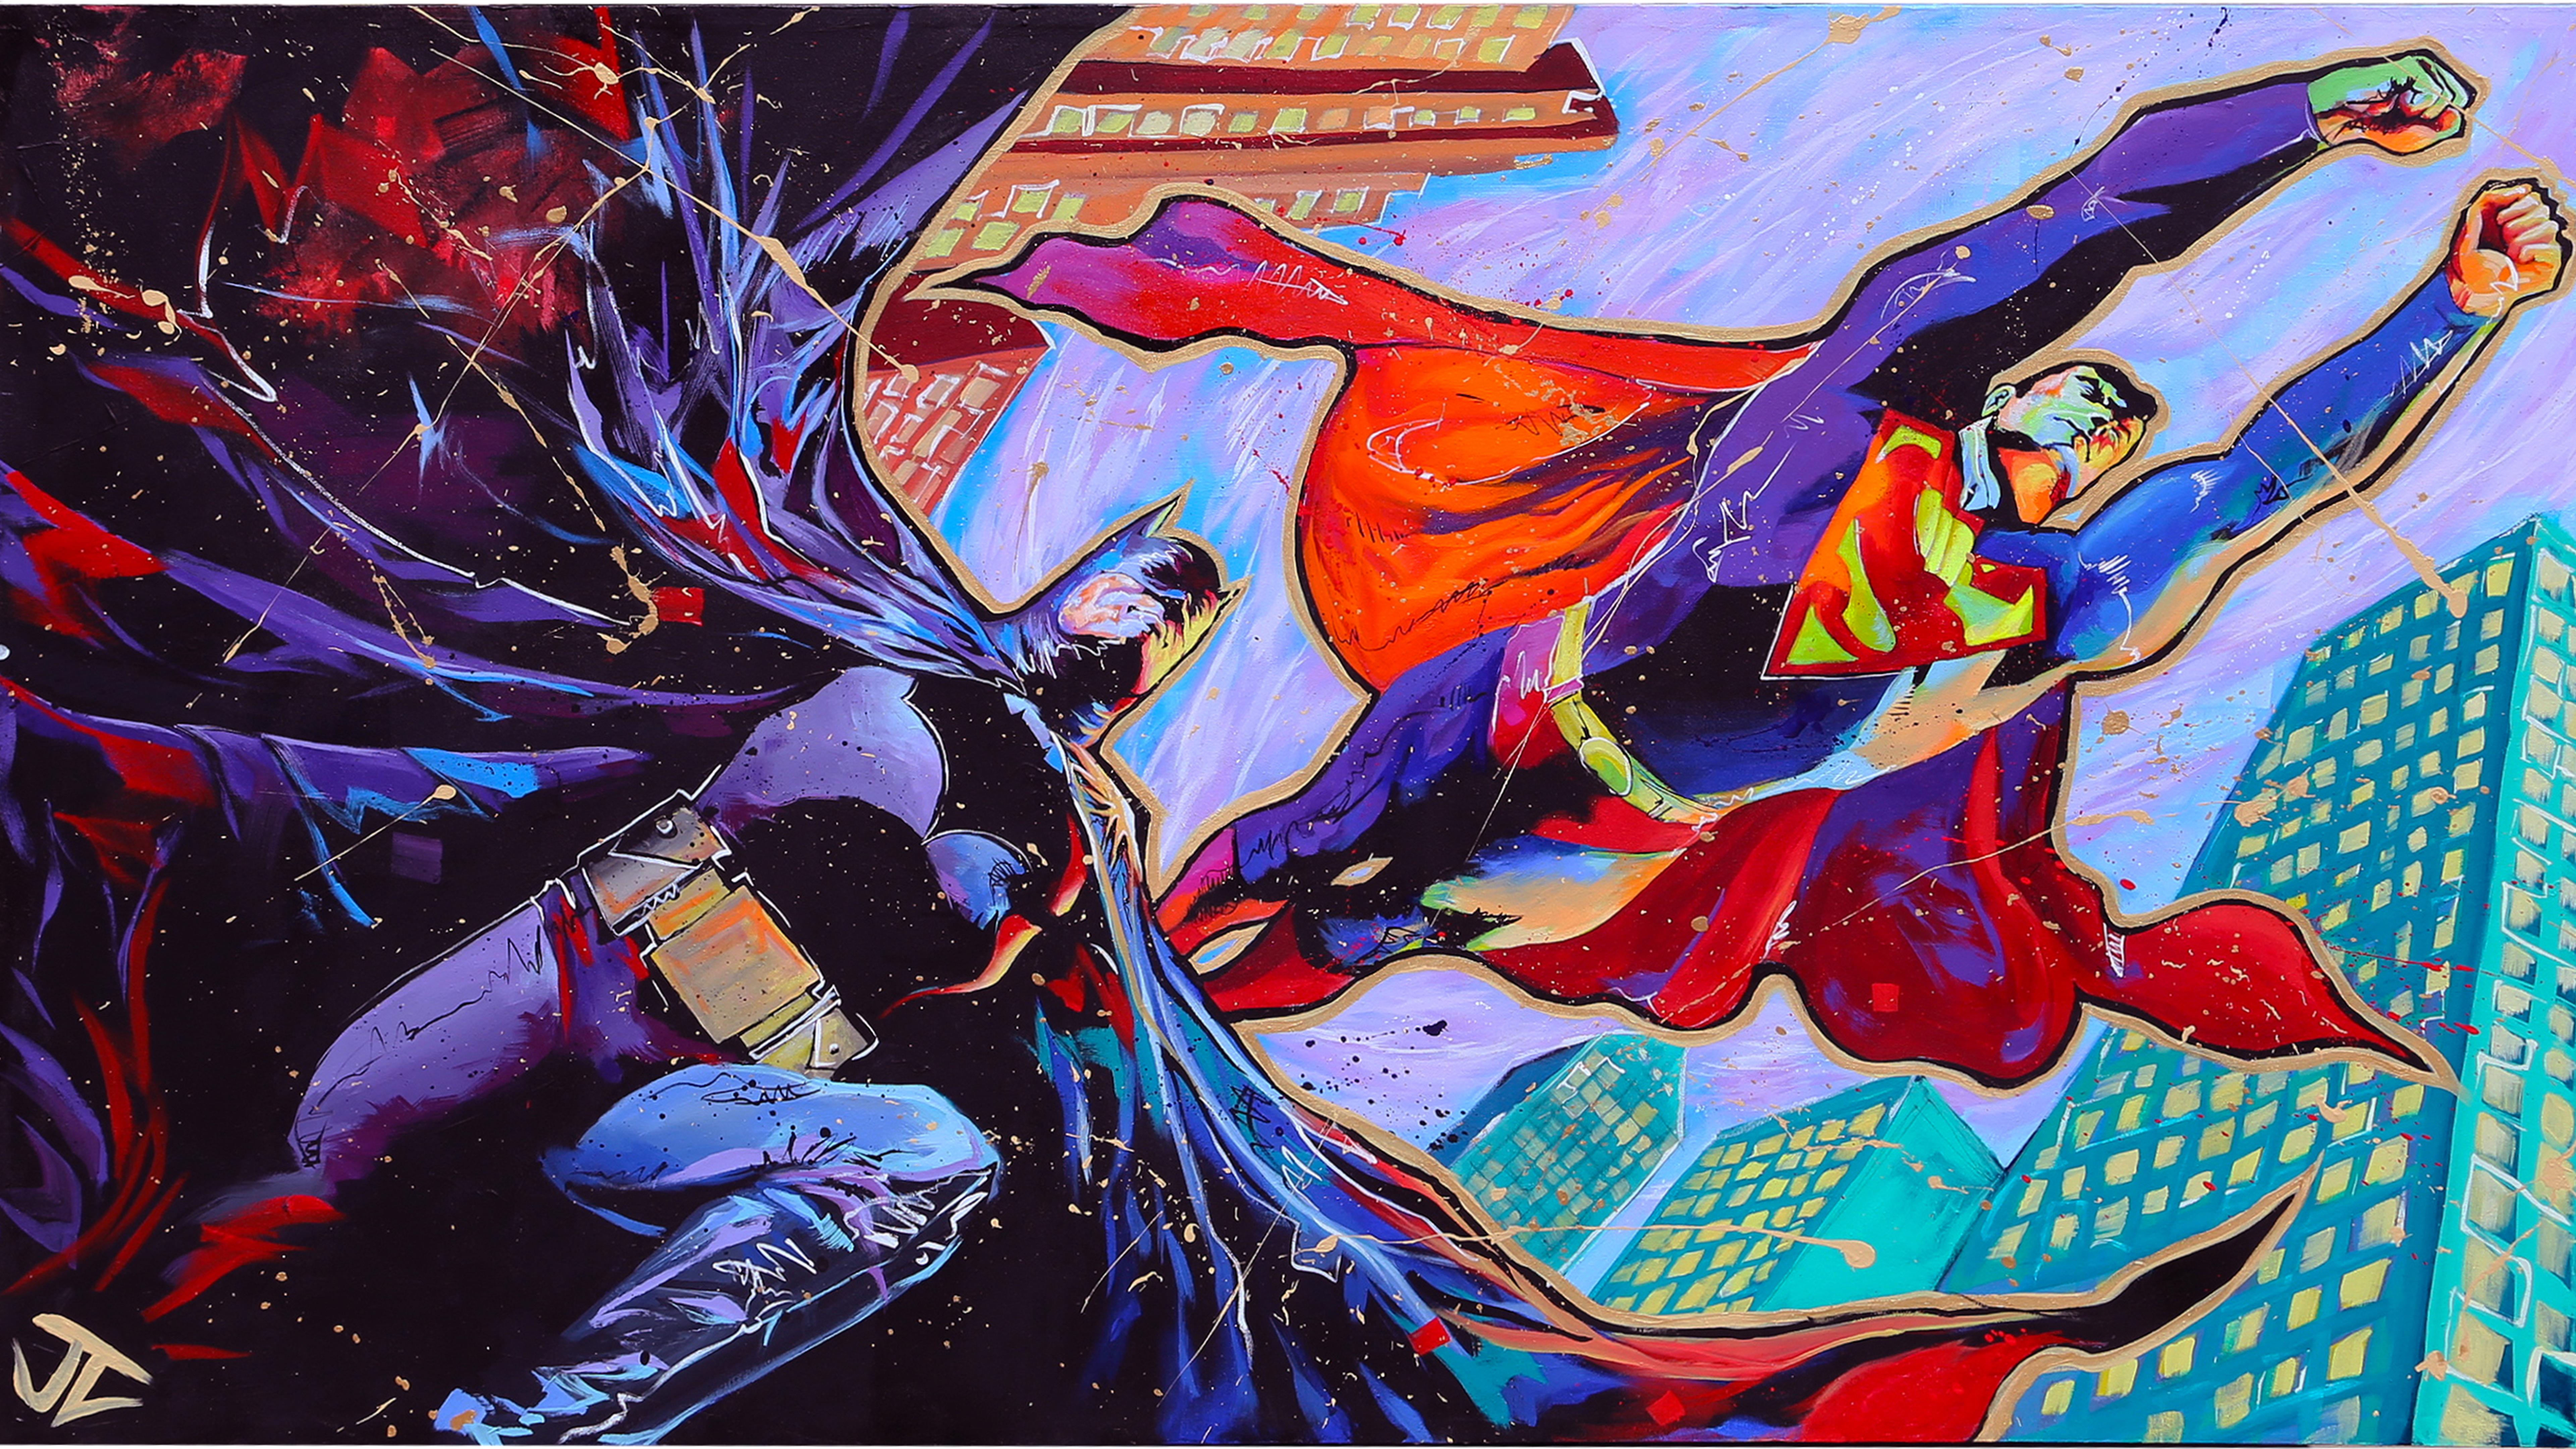 batman-superman-glitch-art-8k-p6.jpg